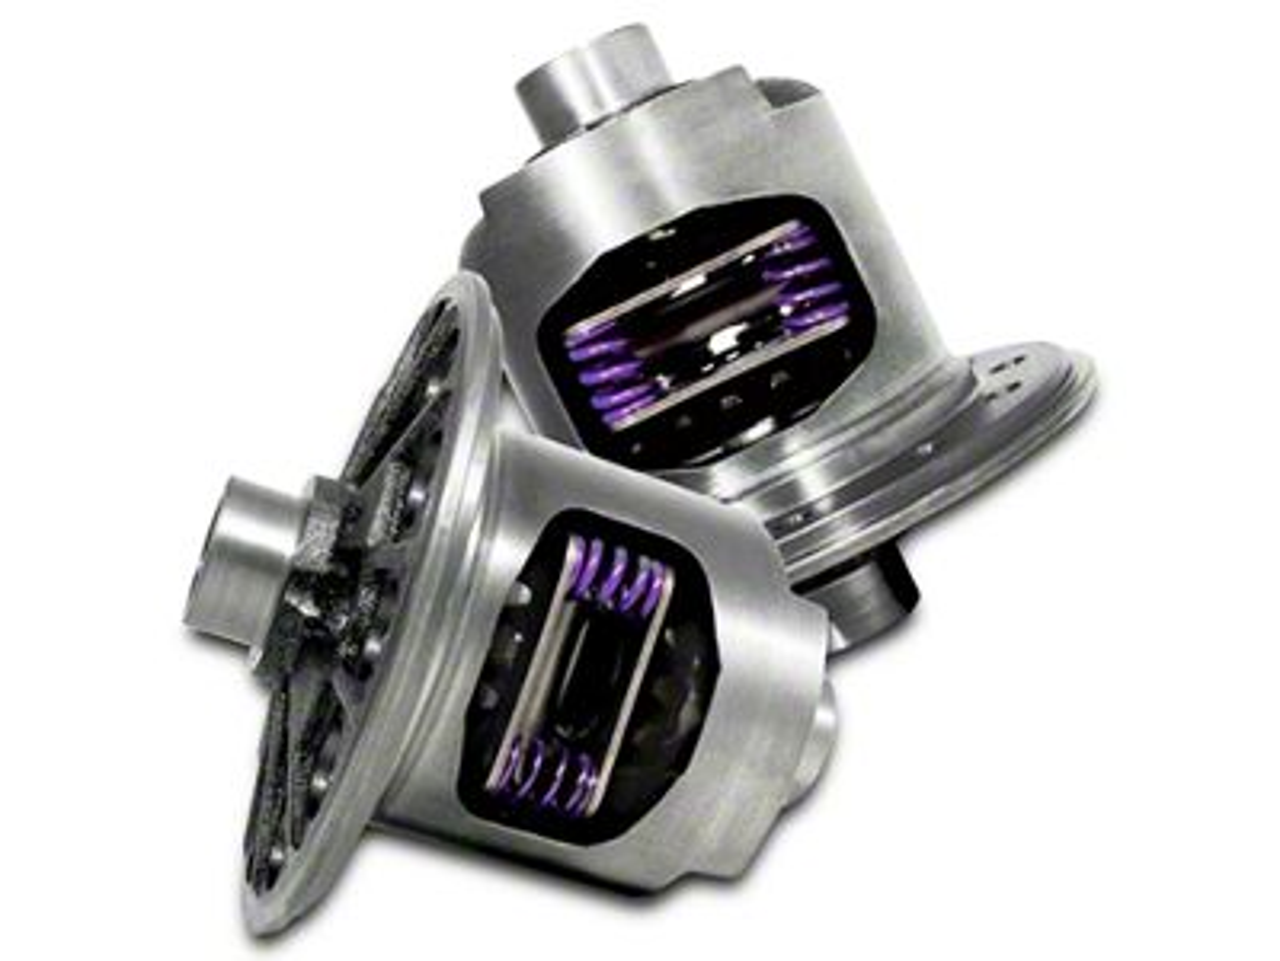 Yukon Gear 9.25 in. Dura Grip Positraction Rear Differential (02-10 RAM 1500)